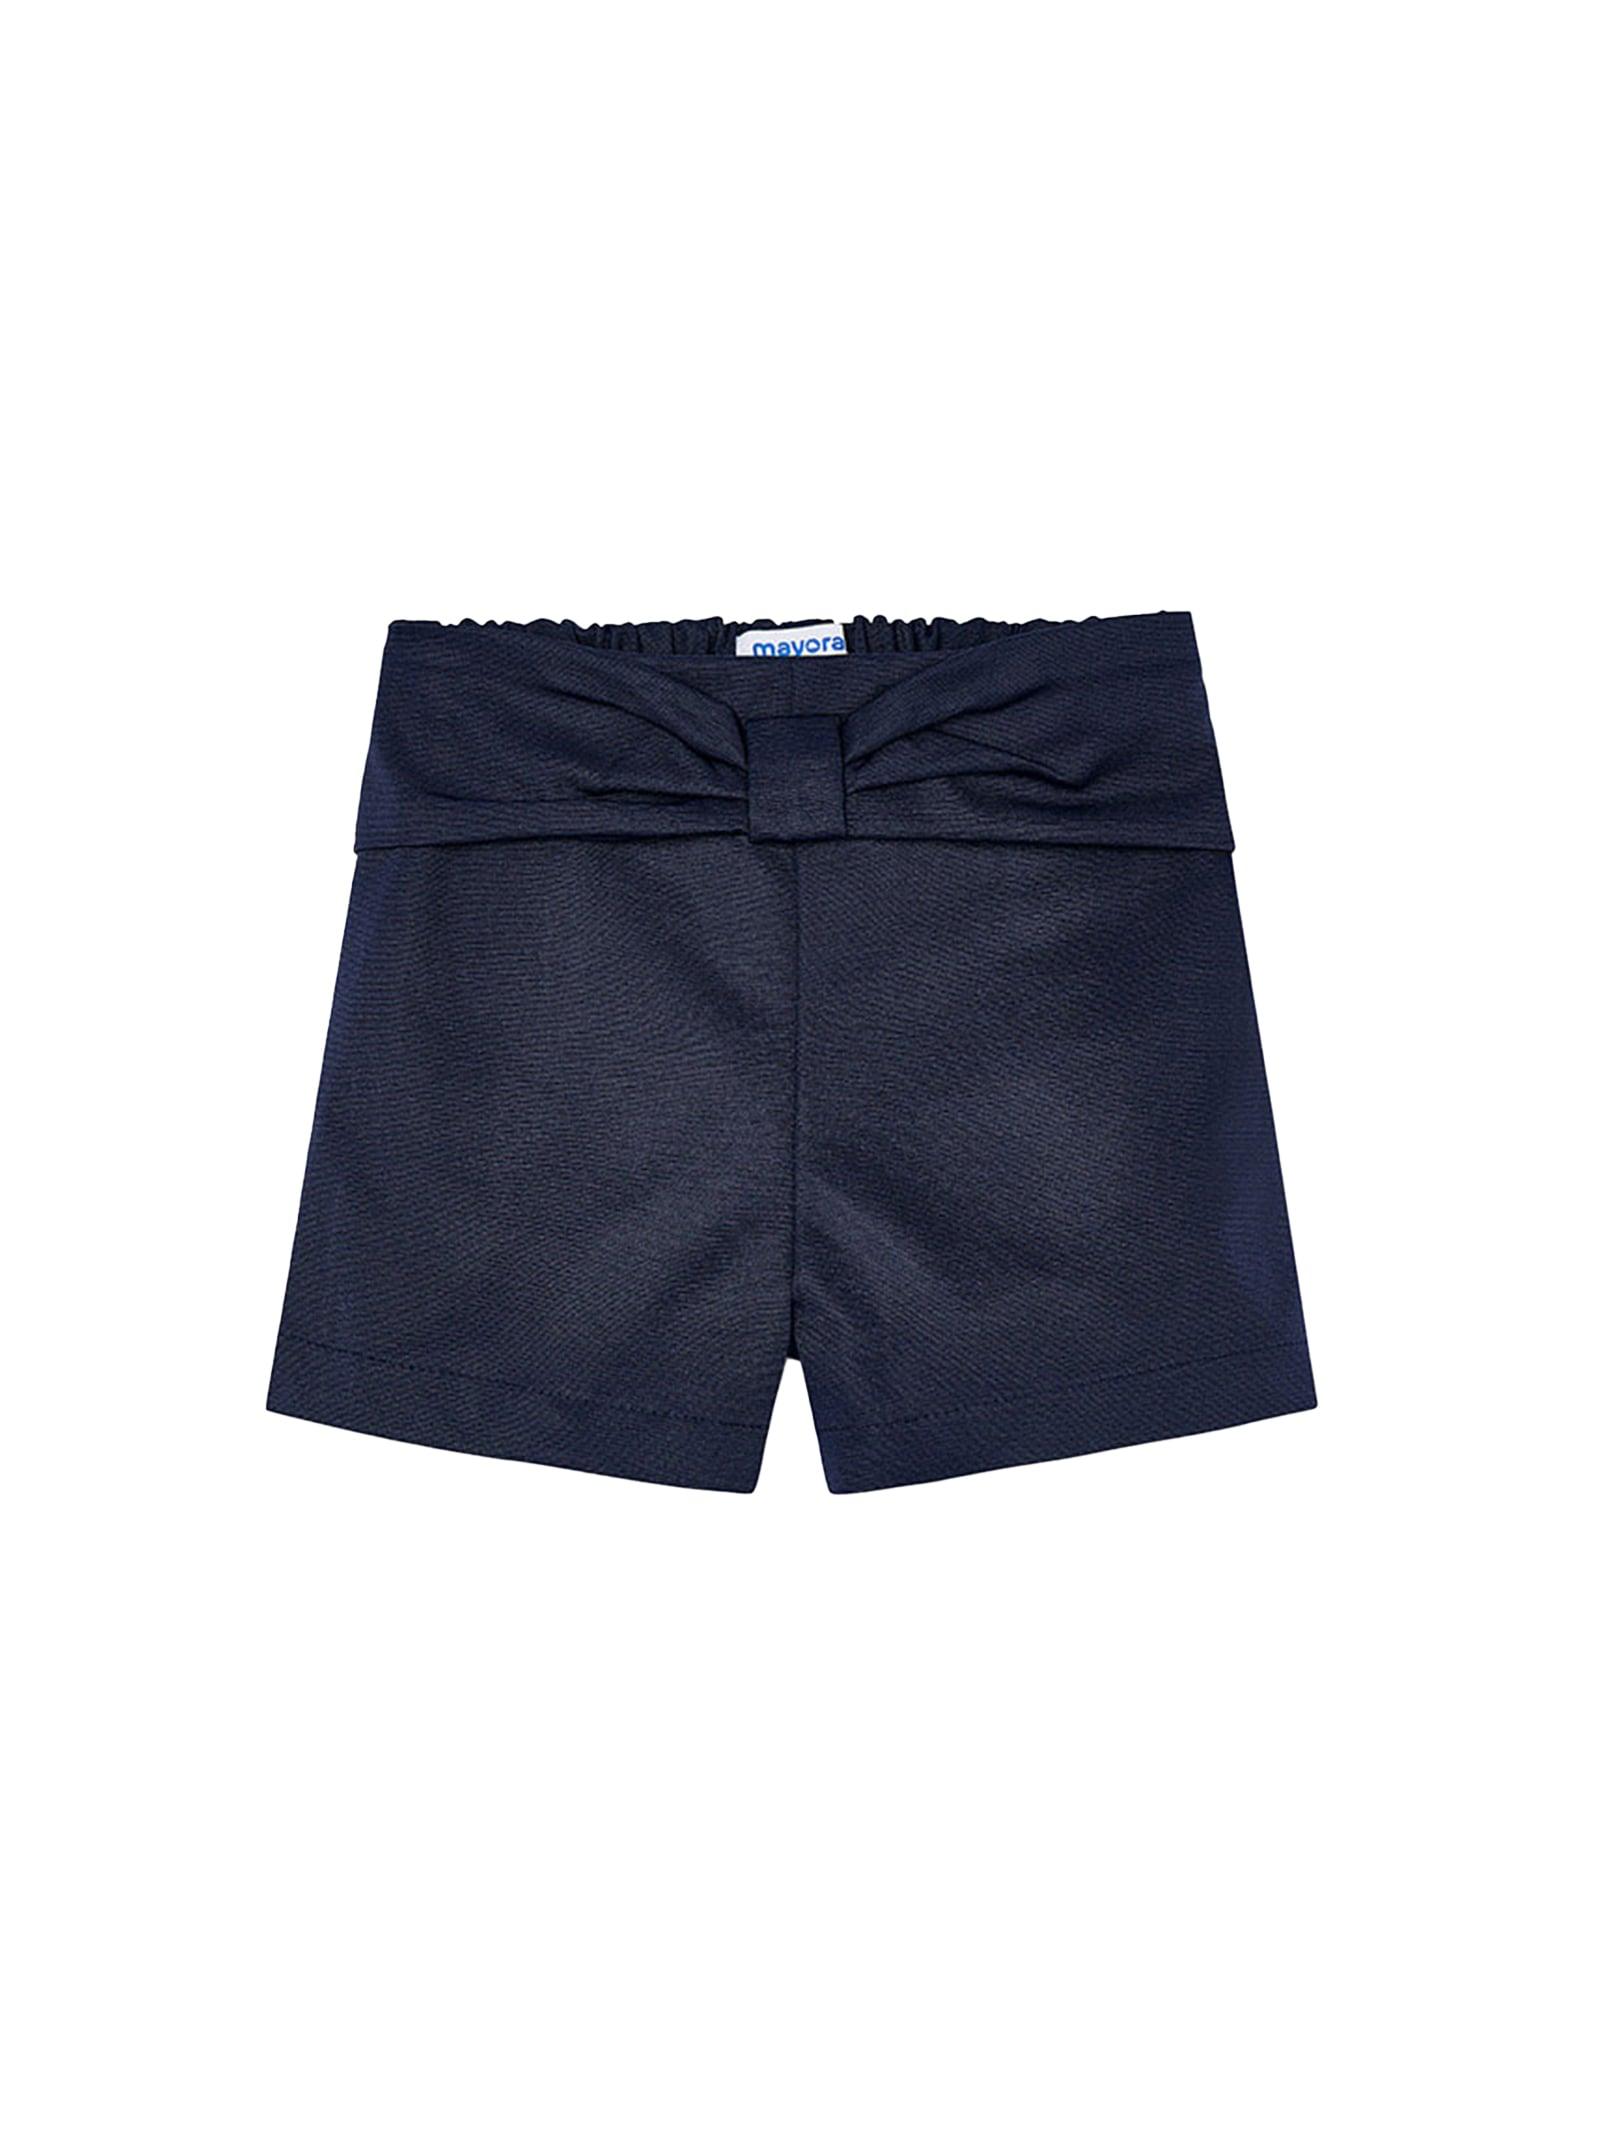 Shorts Ecofriends Fiocco MAYORAL | Shorts | 3203036